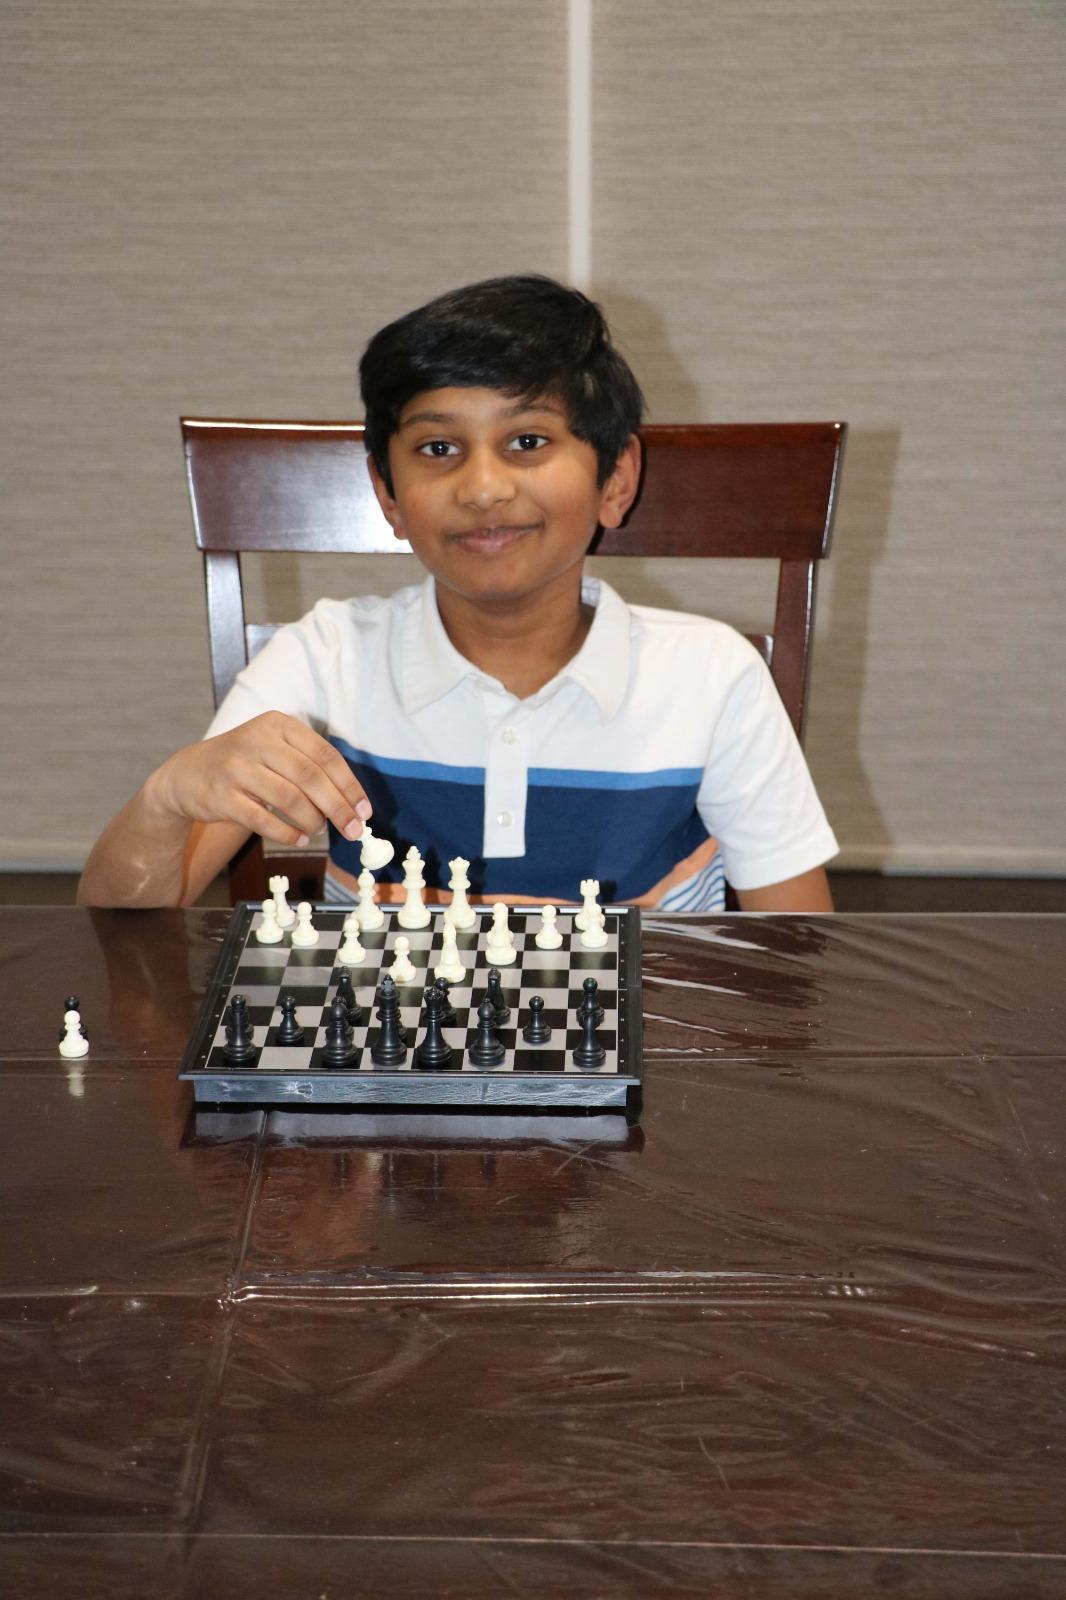 Dhruv wins the 5th Chess Gurukul Global U500 for US Students